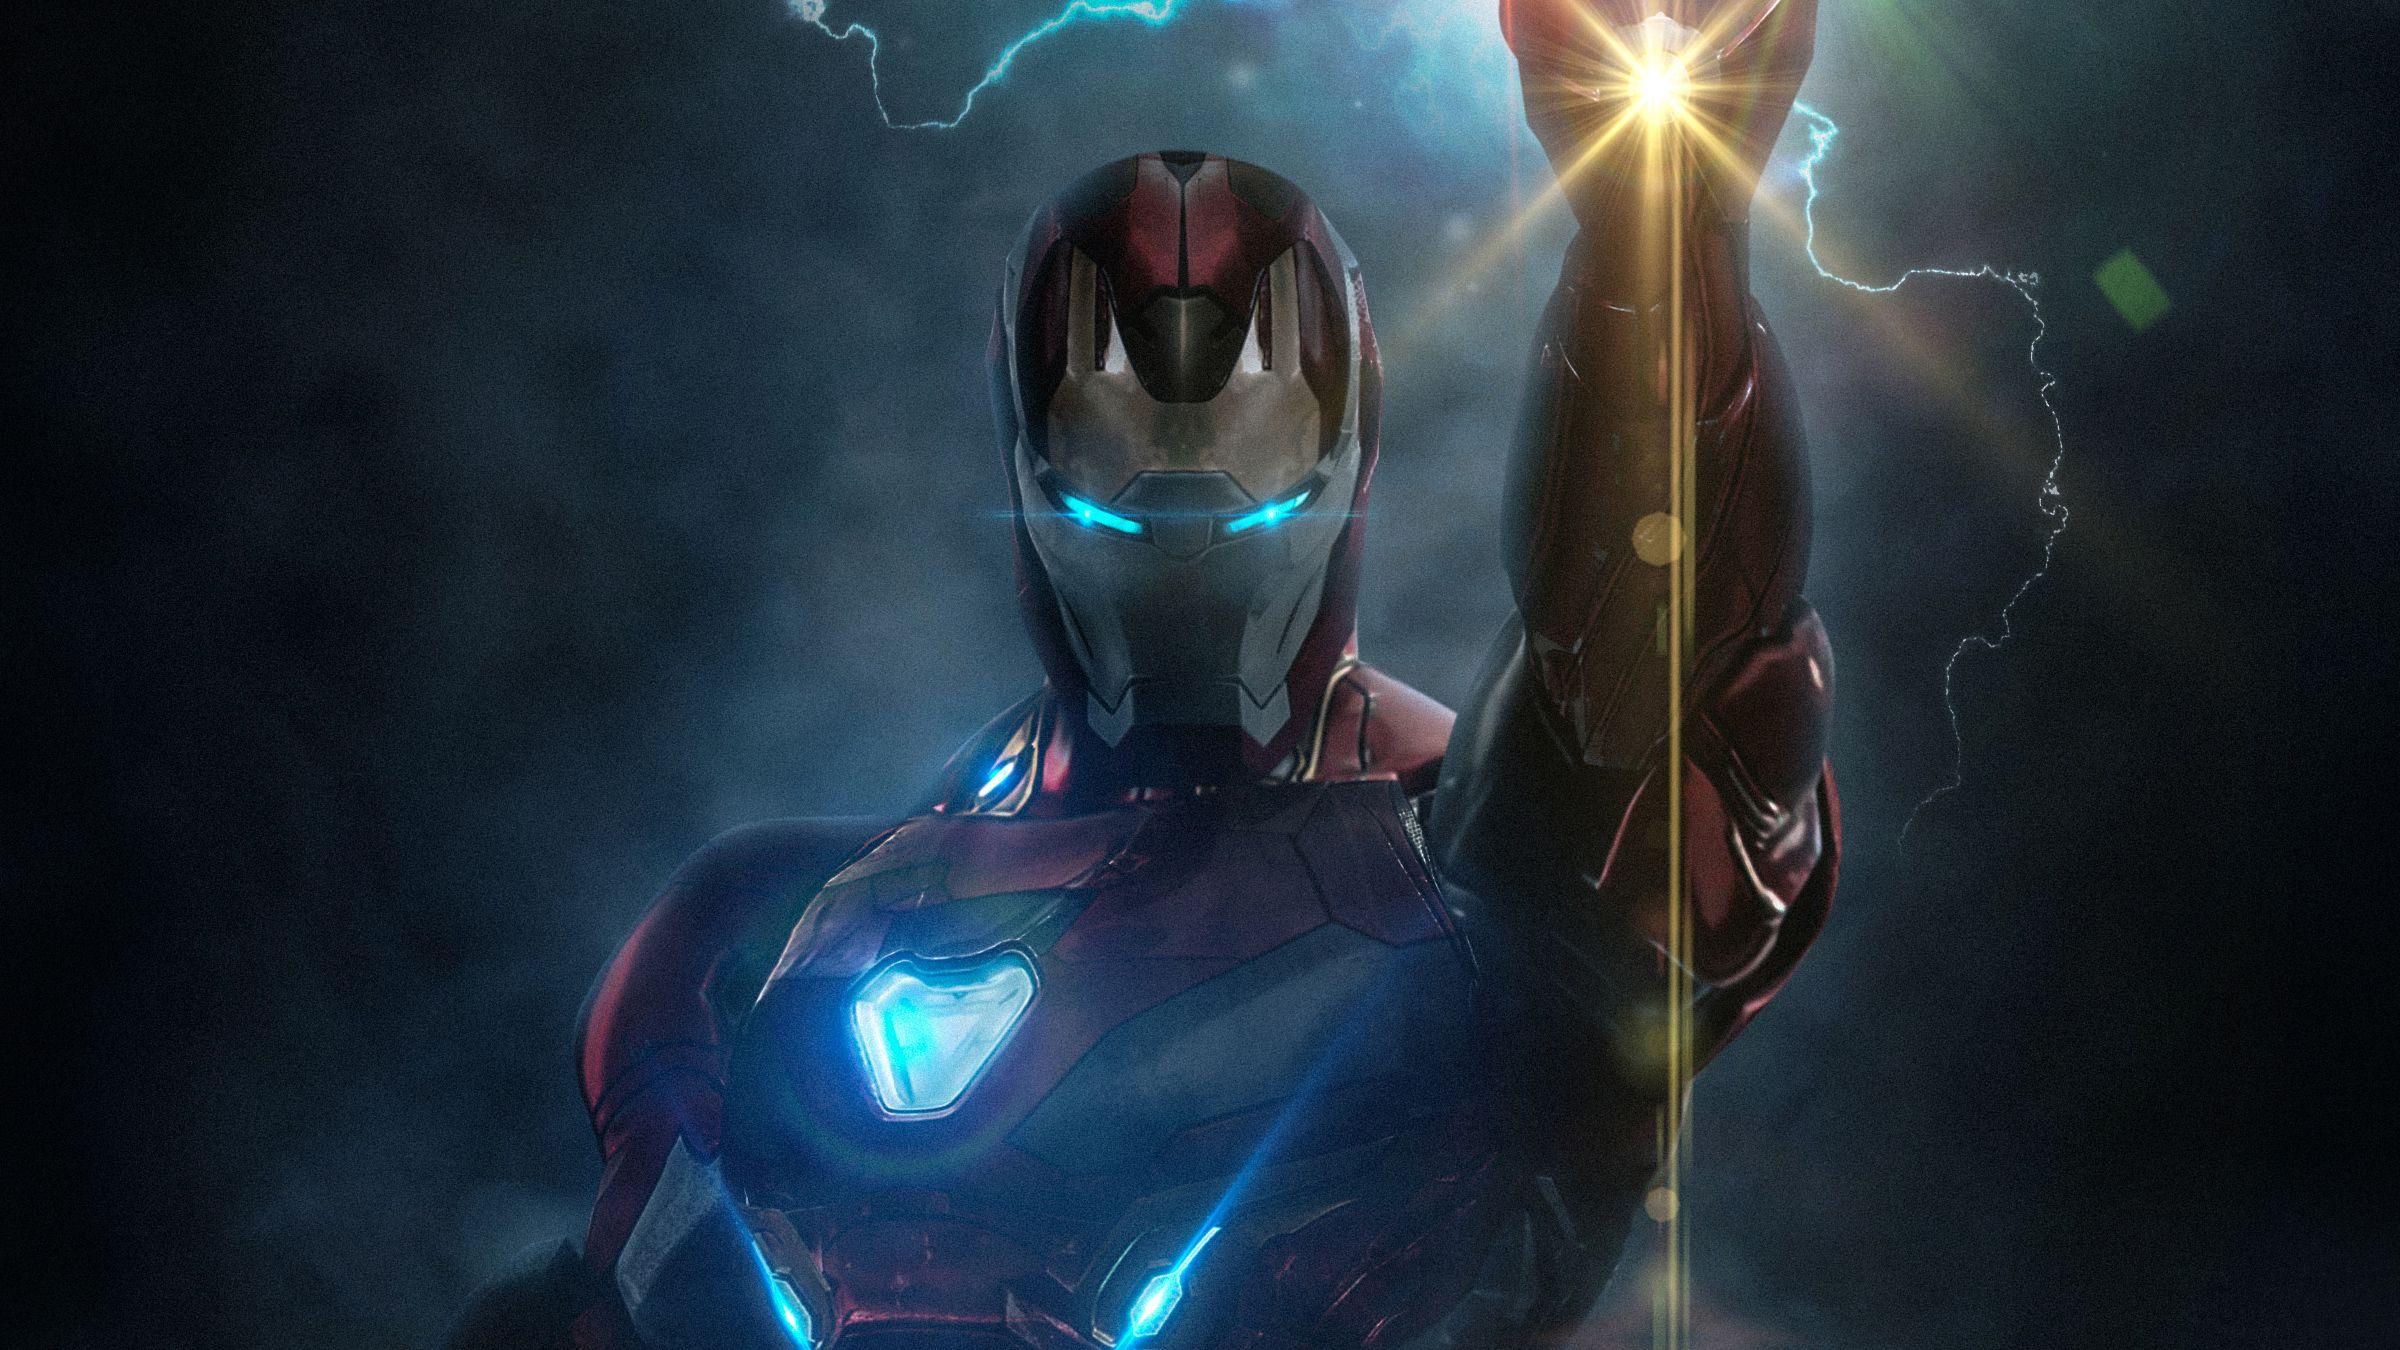 Avengers Endgame Hd Wallpaper For Pc Iron Man Wallpaper Iron Man Hd Wallpaper Hd Wallpapers For Pc